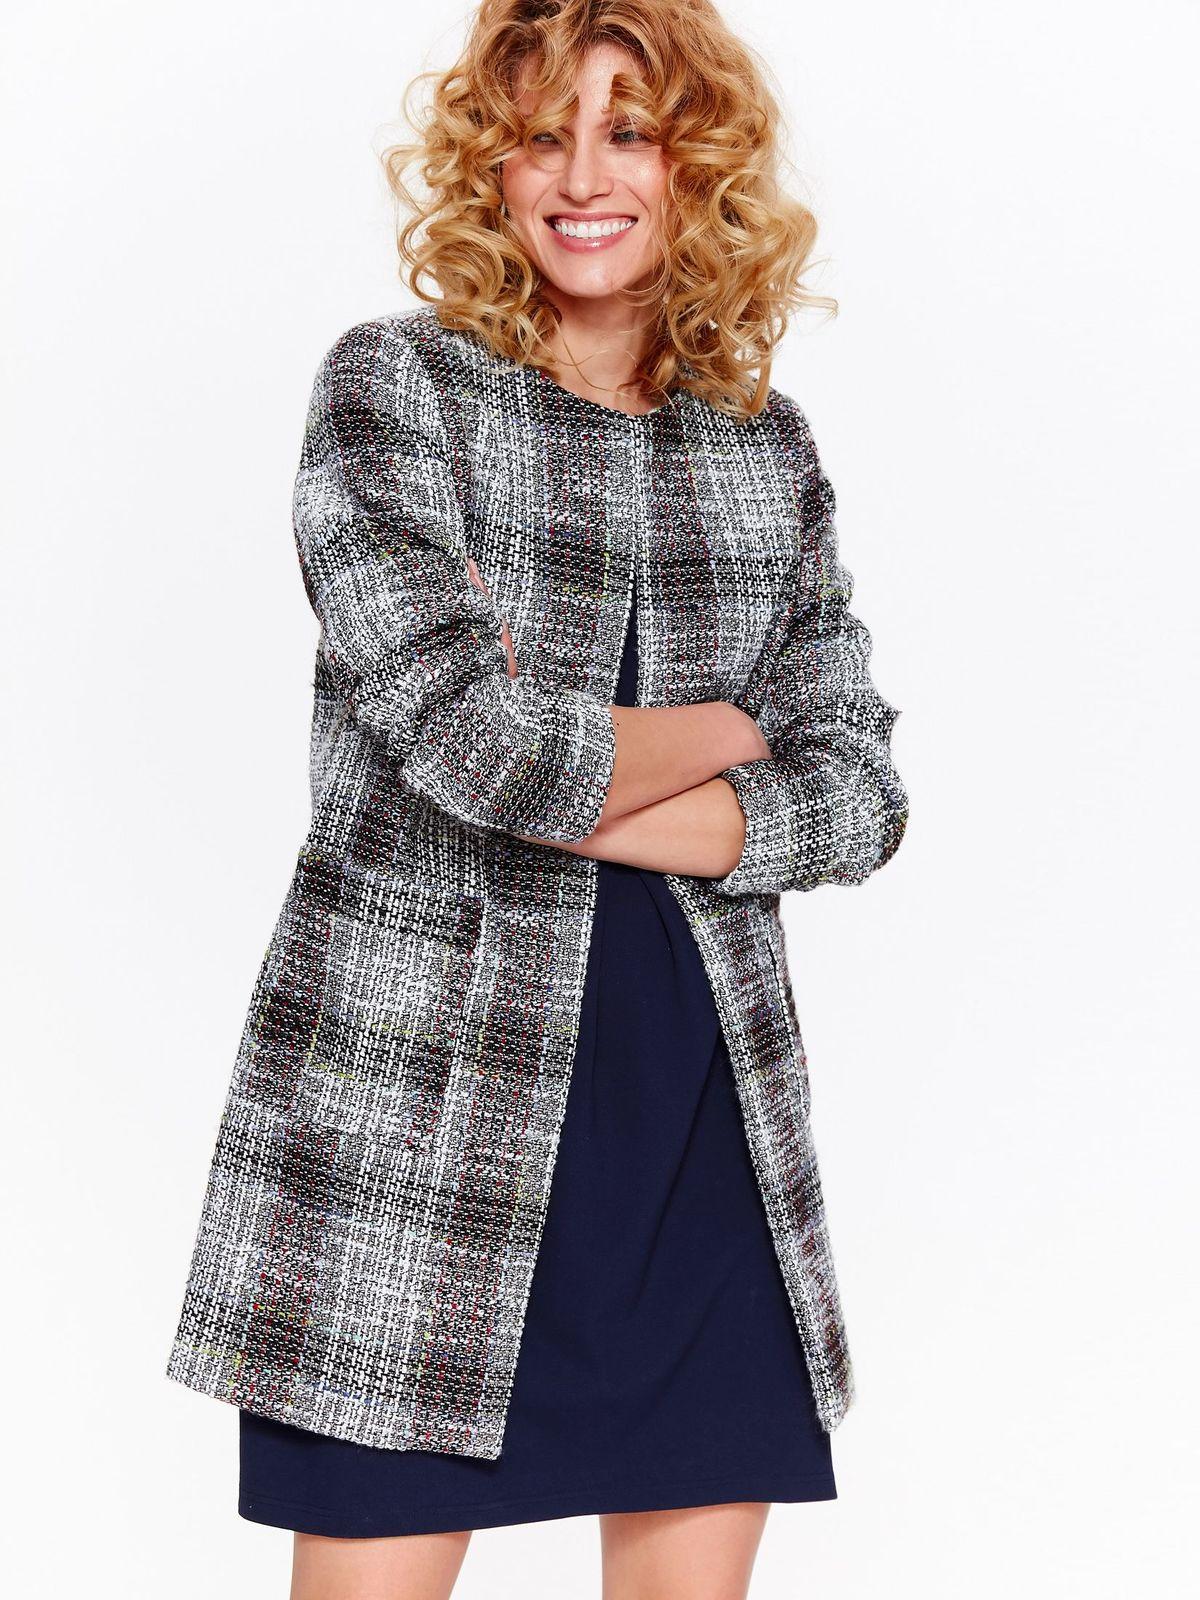 c897409188a6 Style Icon Boutique - Γυναικεία Πανωφόρια - Ακριβότερα Προϊόντα - Σελίδα 1